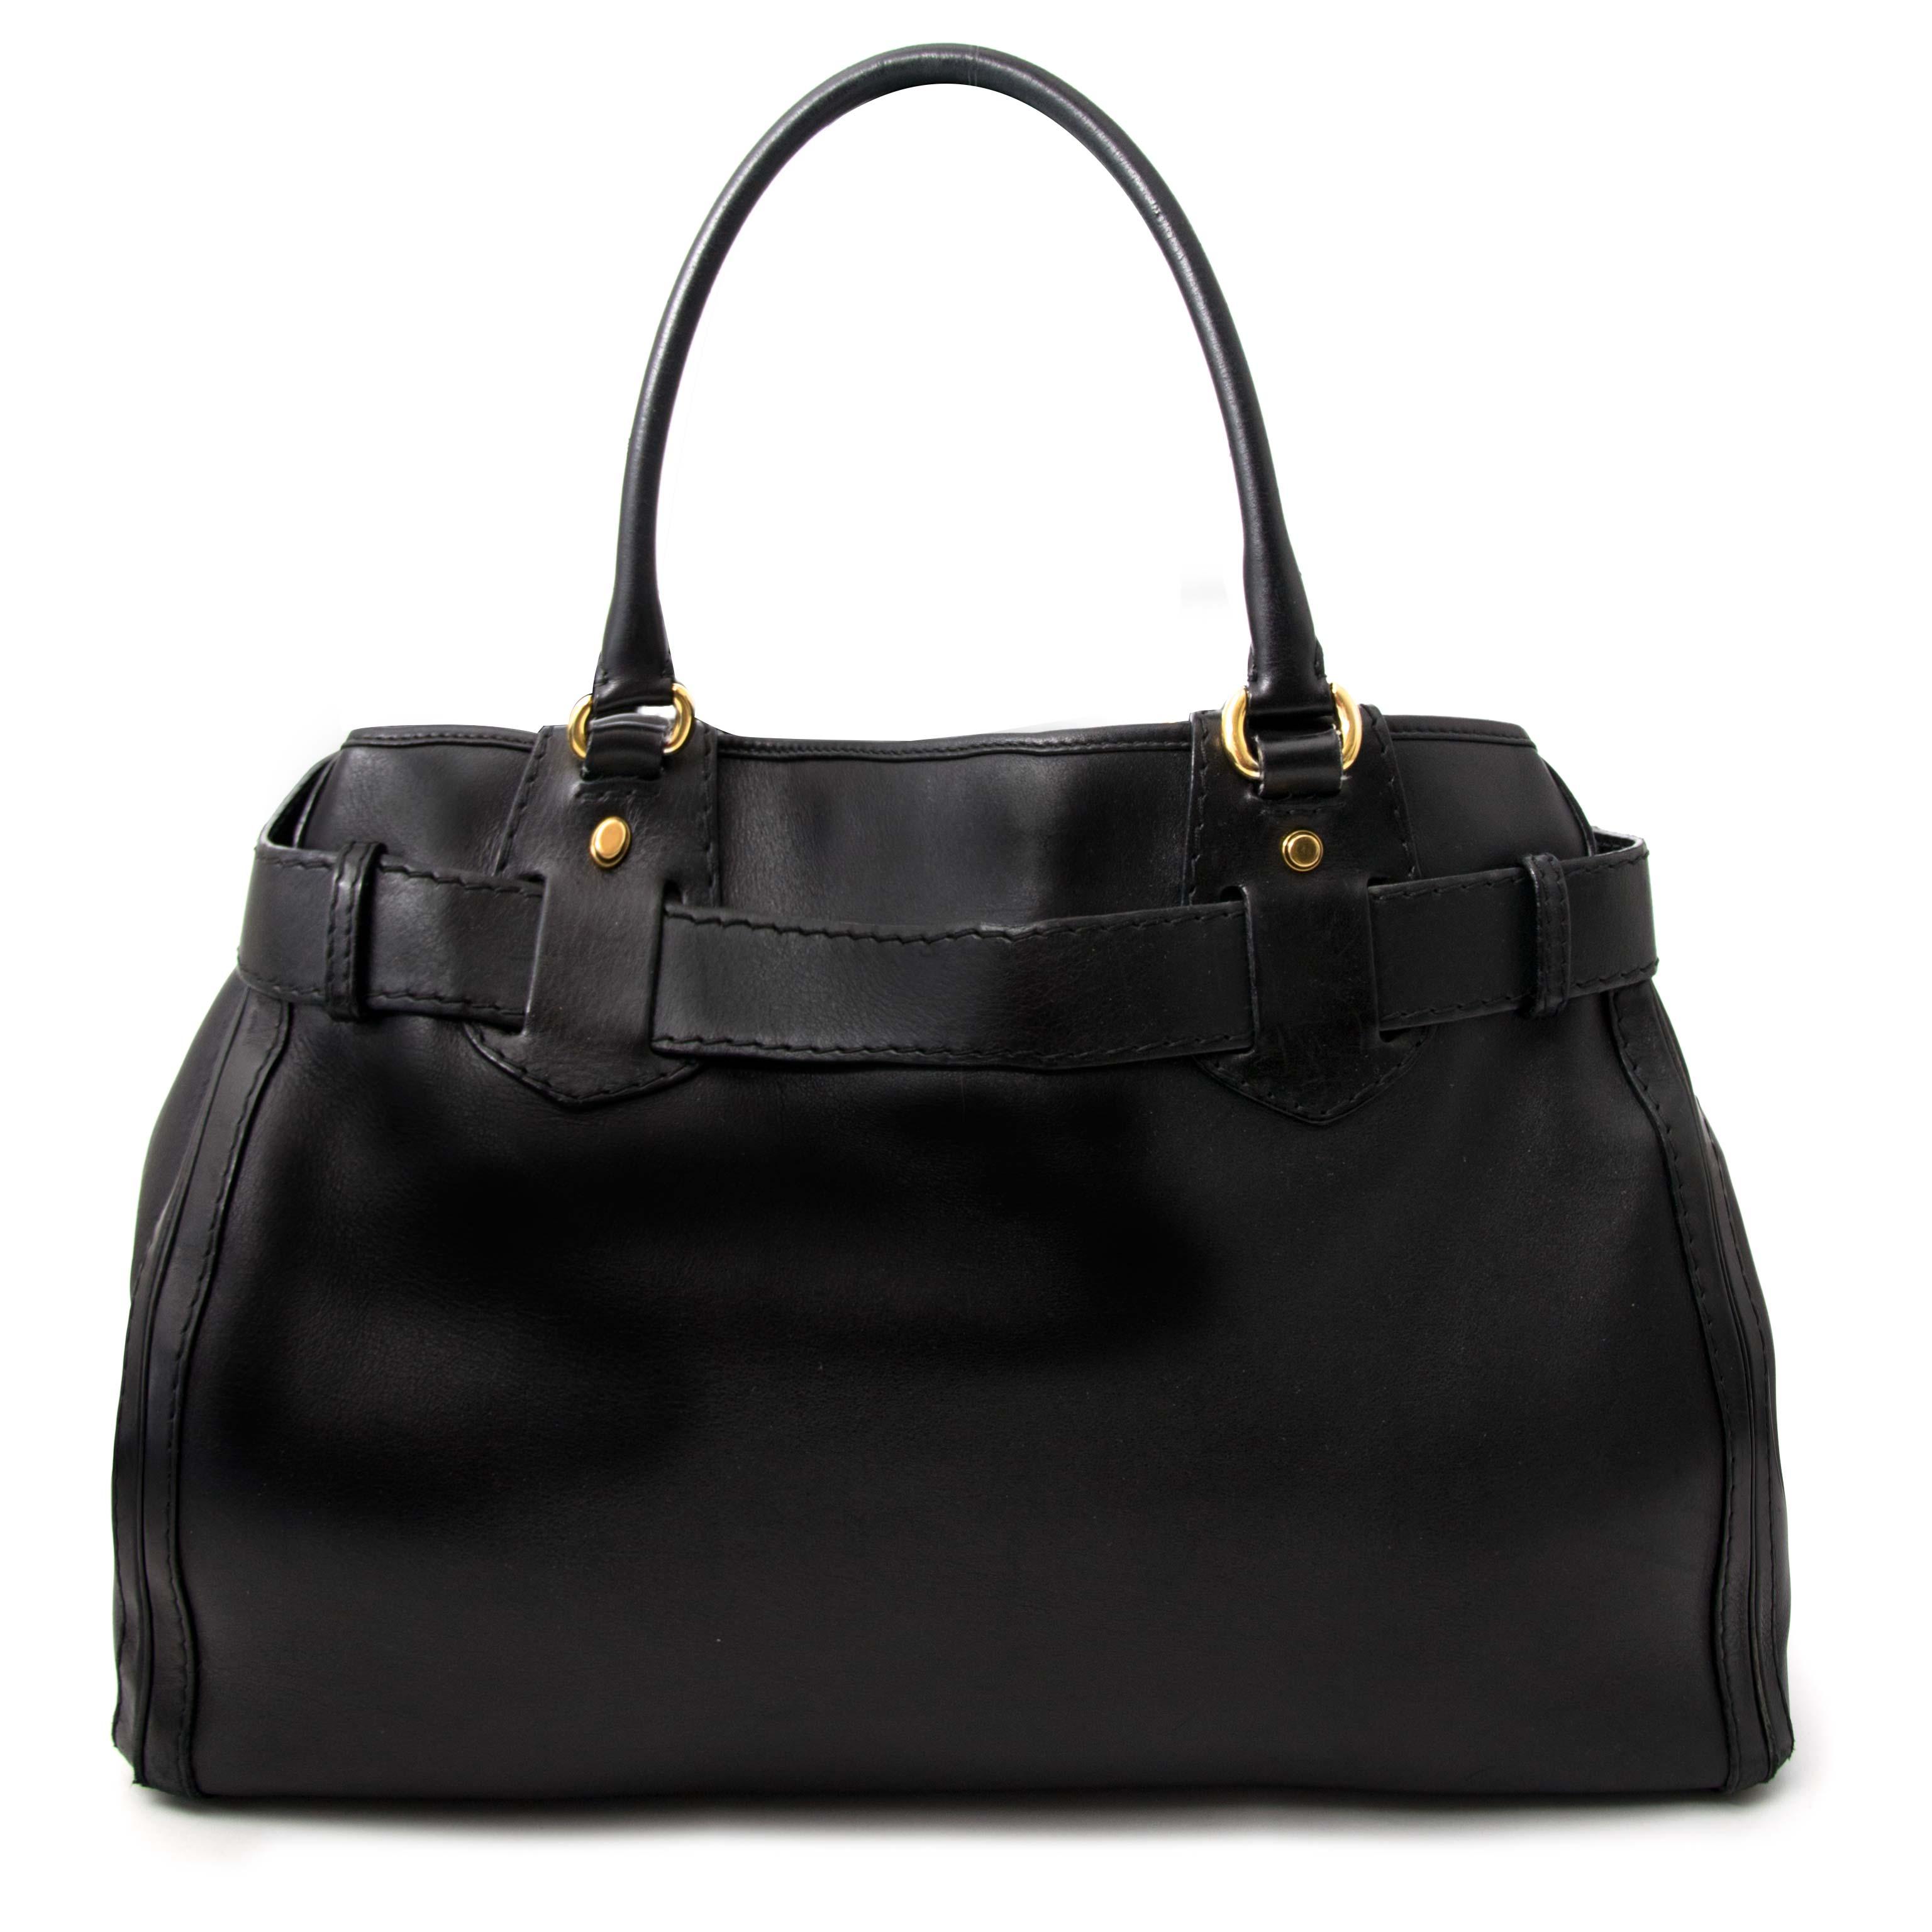 Authentic secondhand Gucci back black Labellov Acheter authentique Gucci sac  à main 5ffc90f9ca0